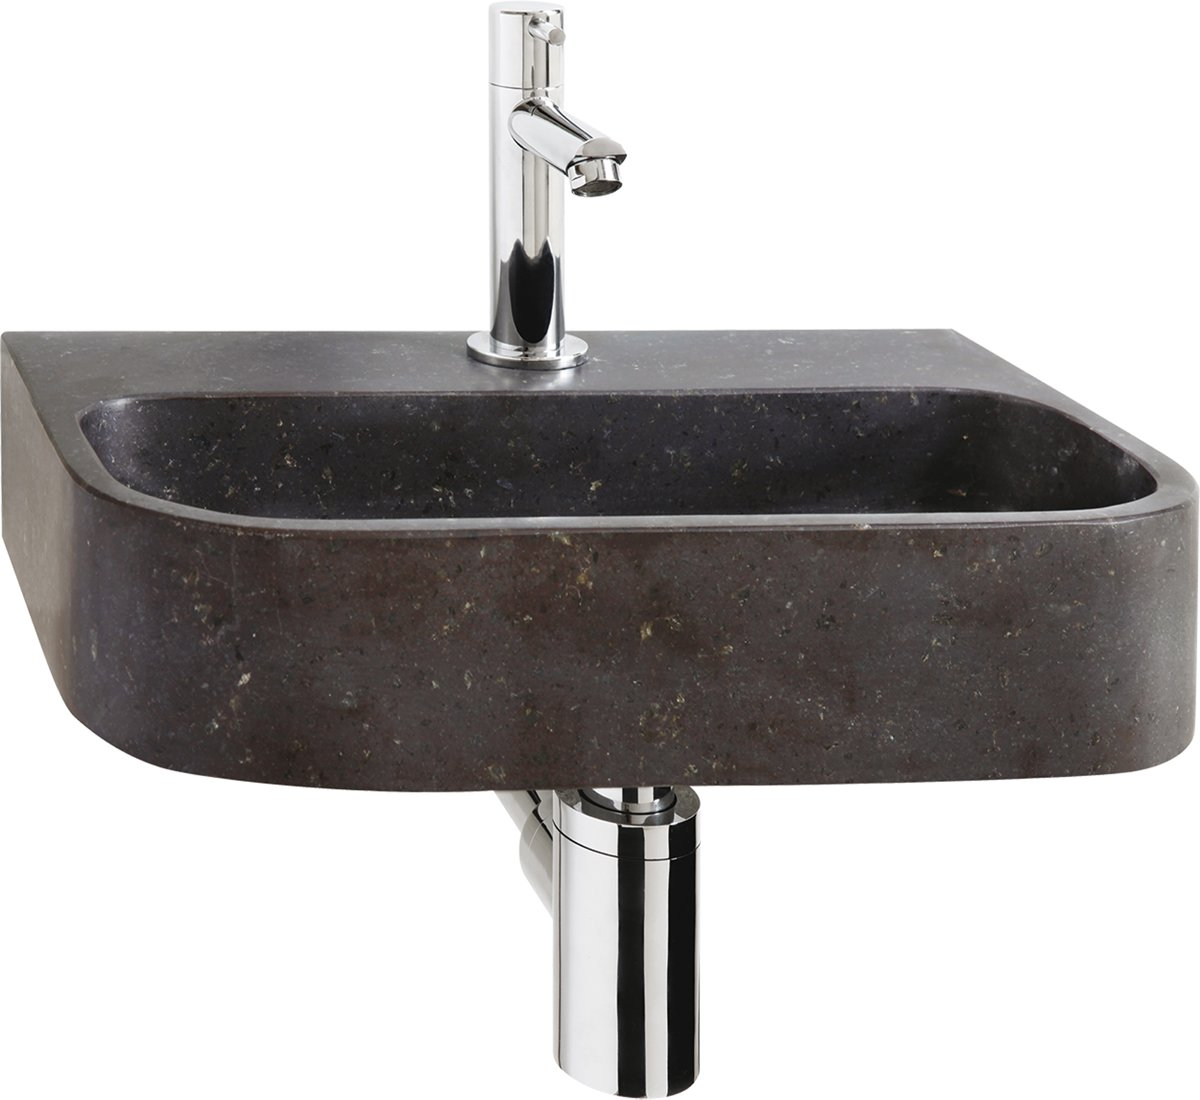 Fonteinset Differnz Ovale Ovaal 38x24x7cm Natuursteen Chroom Toiletkraan Sifon Plug kopen